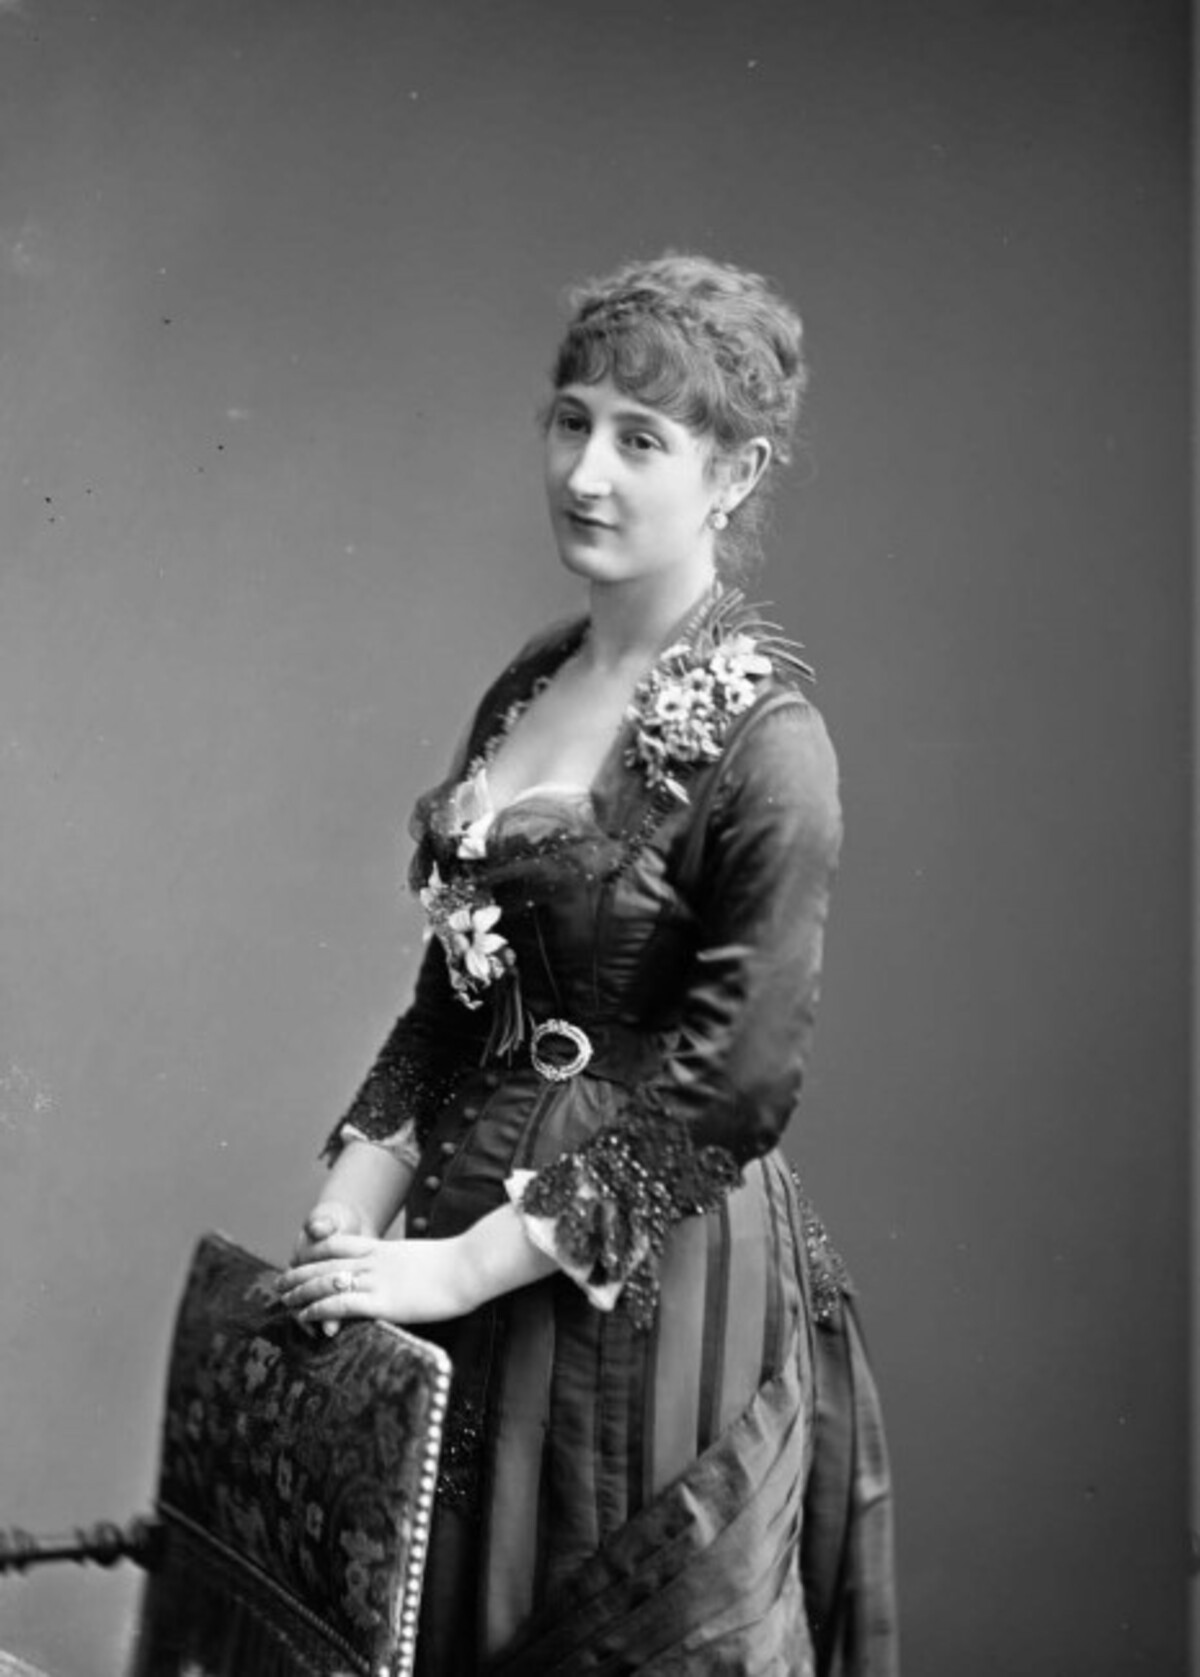 Virginie avegno 1878 pd photo